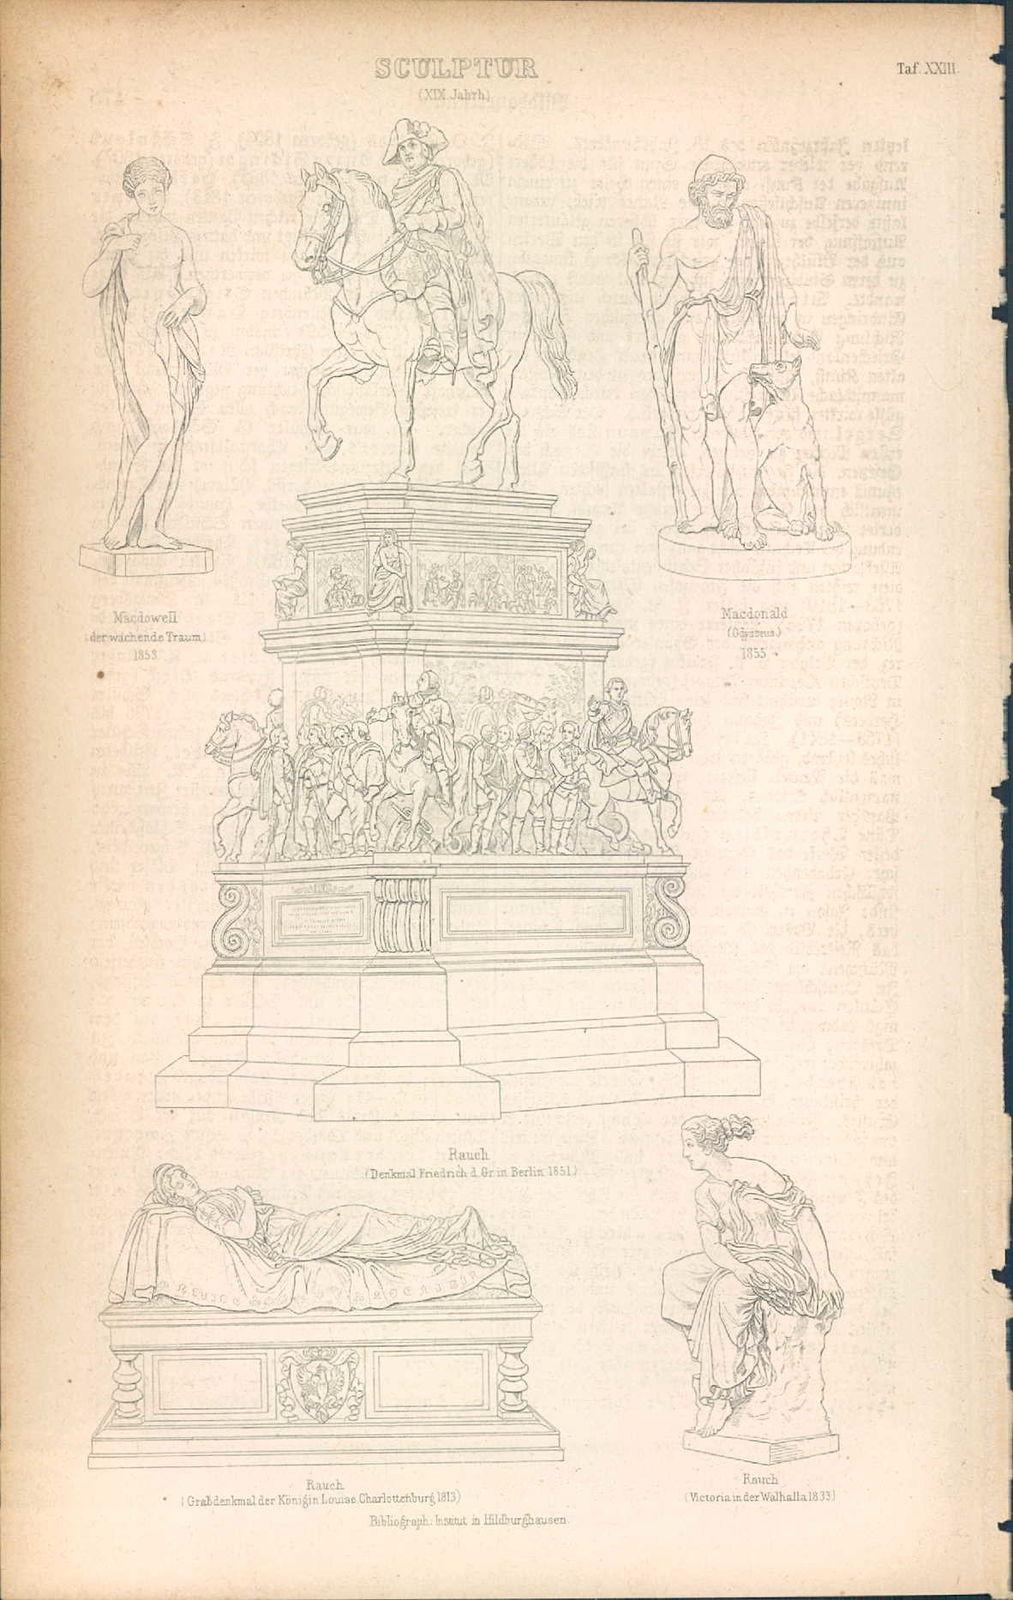 KD4641 - Stich Druck - 1871 - Sculptur XIX Jahrhundert - 5 Ansichten.